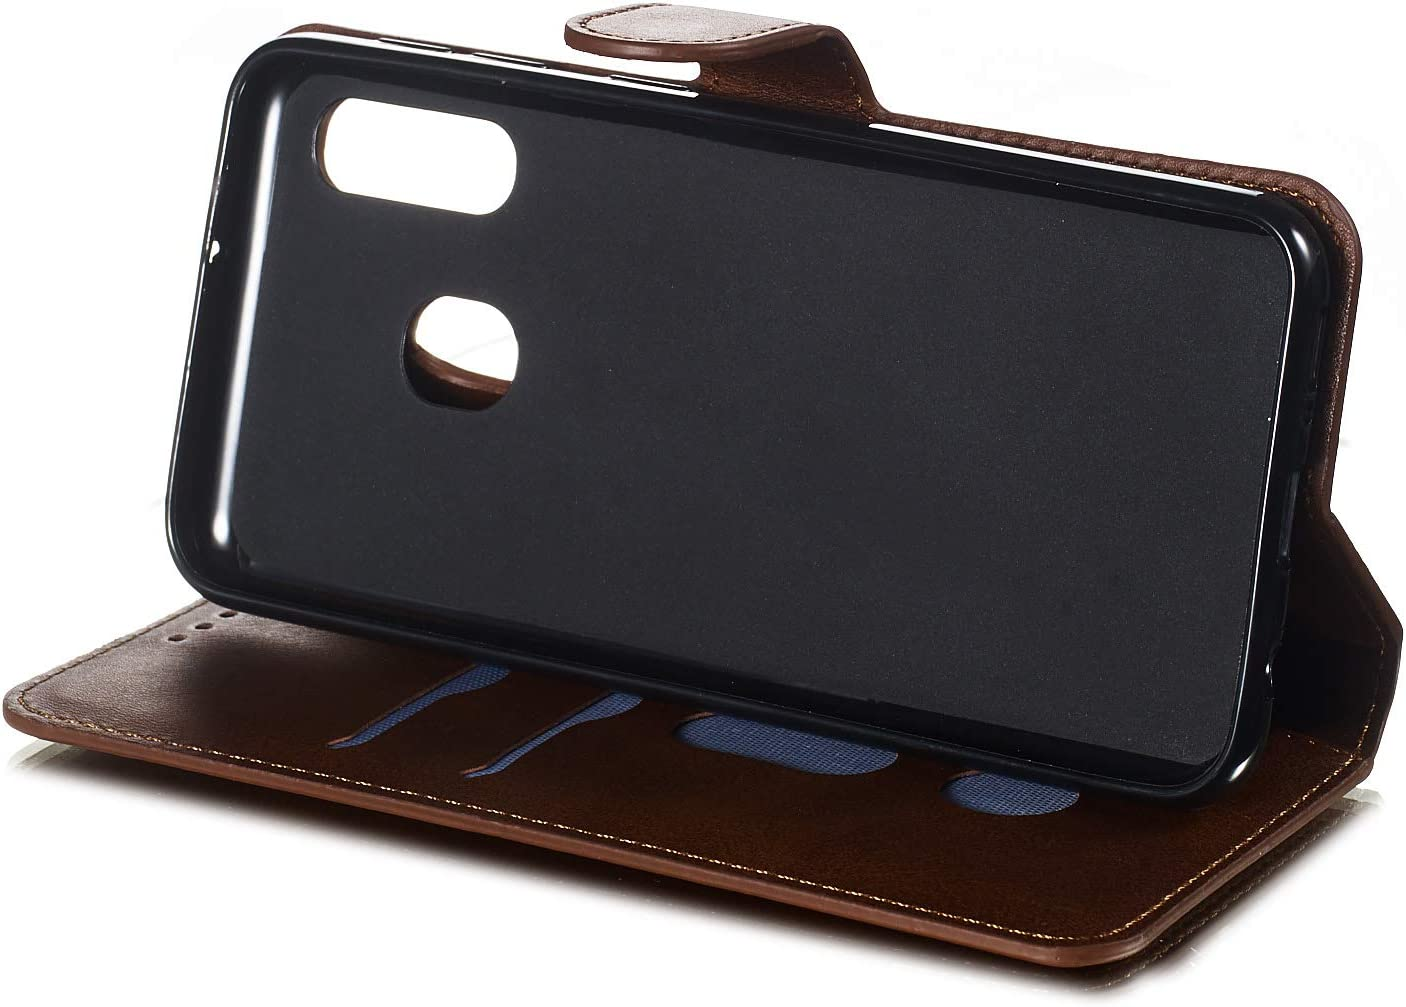 H/ülle Leder Case mit Standfunktion Magnetverschluss Flipcase Klapph/ülle kompatibel mit Samsung Galaxy A20e//A10e A10e Handyh/ülle DOYYO080109 Rot Docrax Galaxy A20e